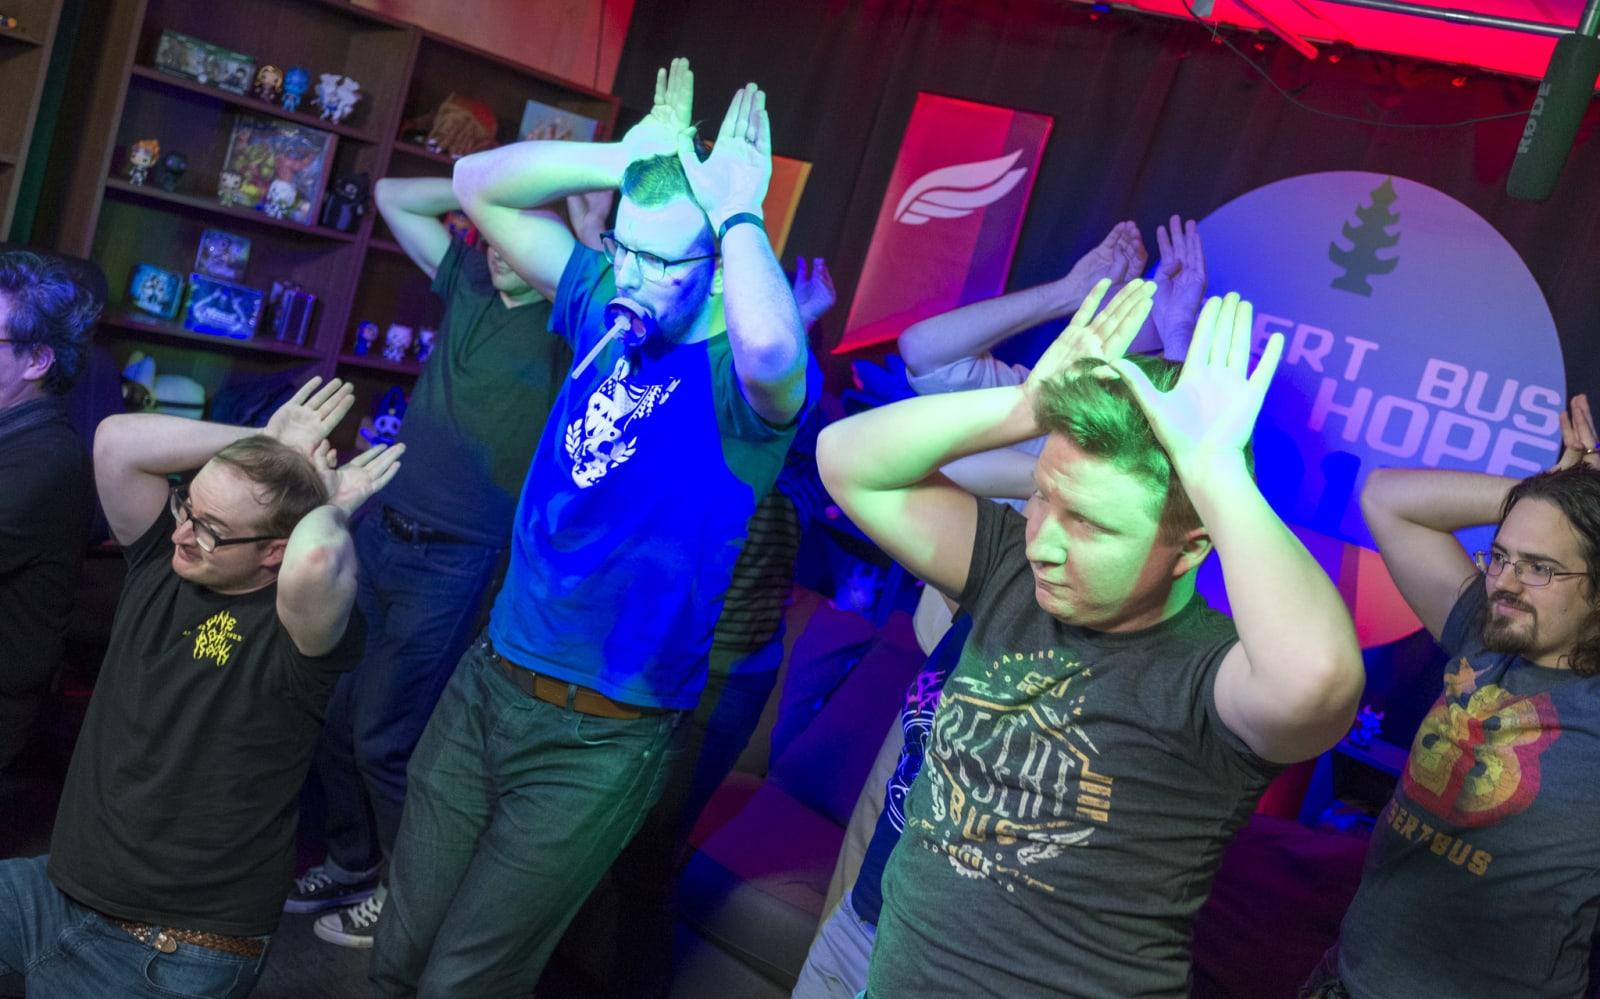 'Desert Bus' video game charity has raised nearly $80,000